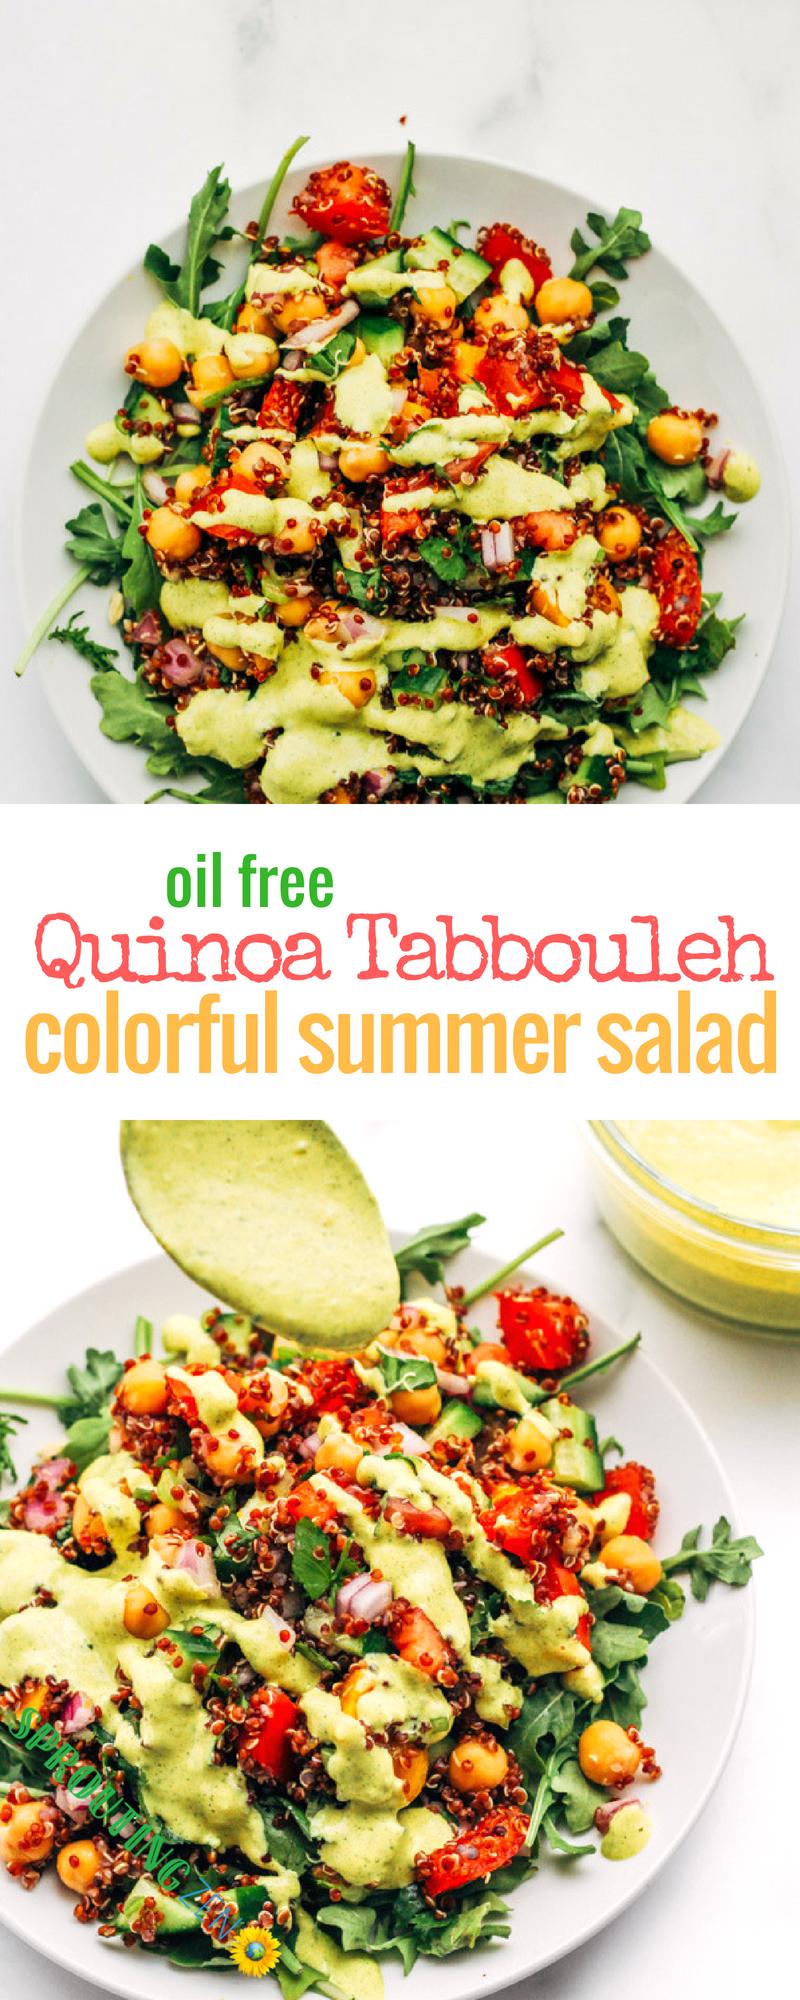 Quinoa Tabbouleh Summer Salad Recipe That is Oil free. #vegan #plantbased #tabbouleh #summer #summerecipes #summersalads